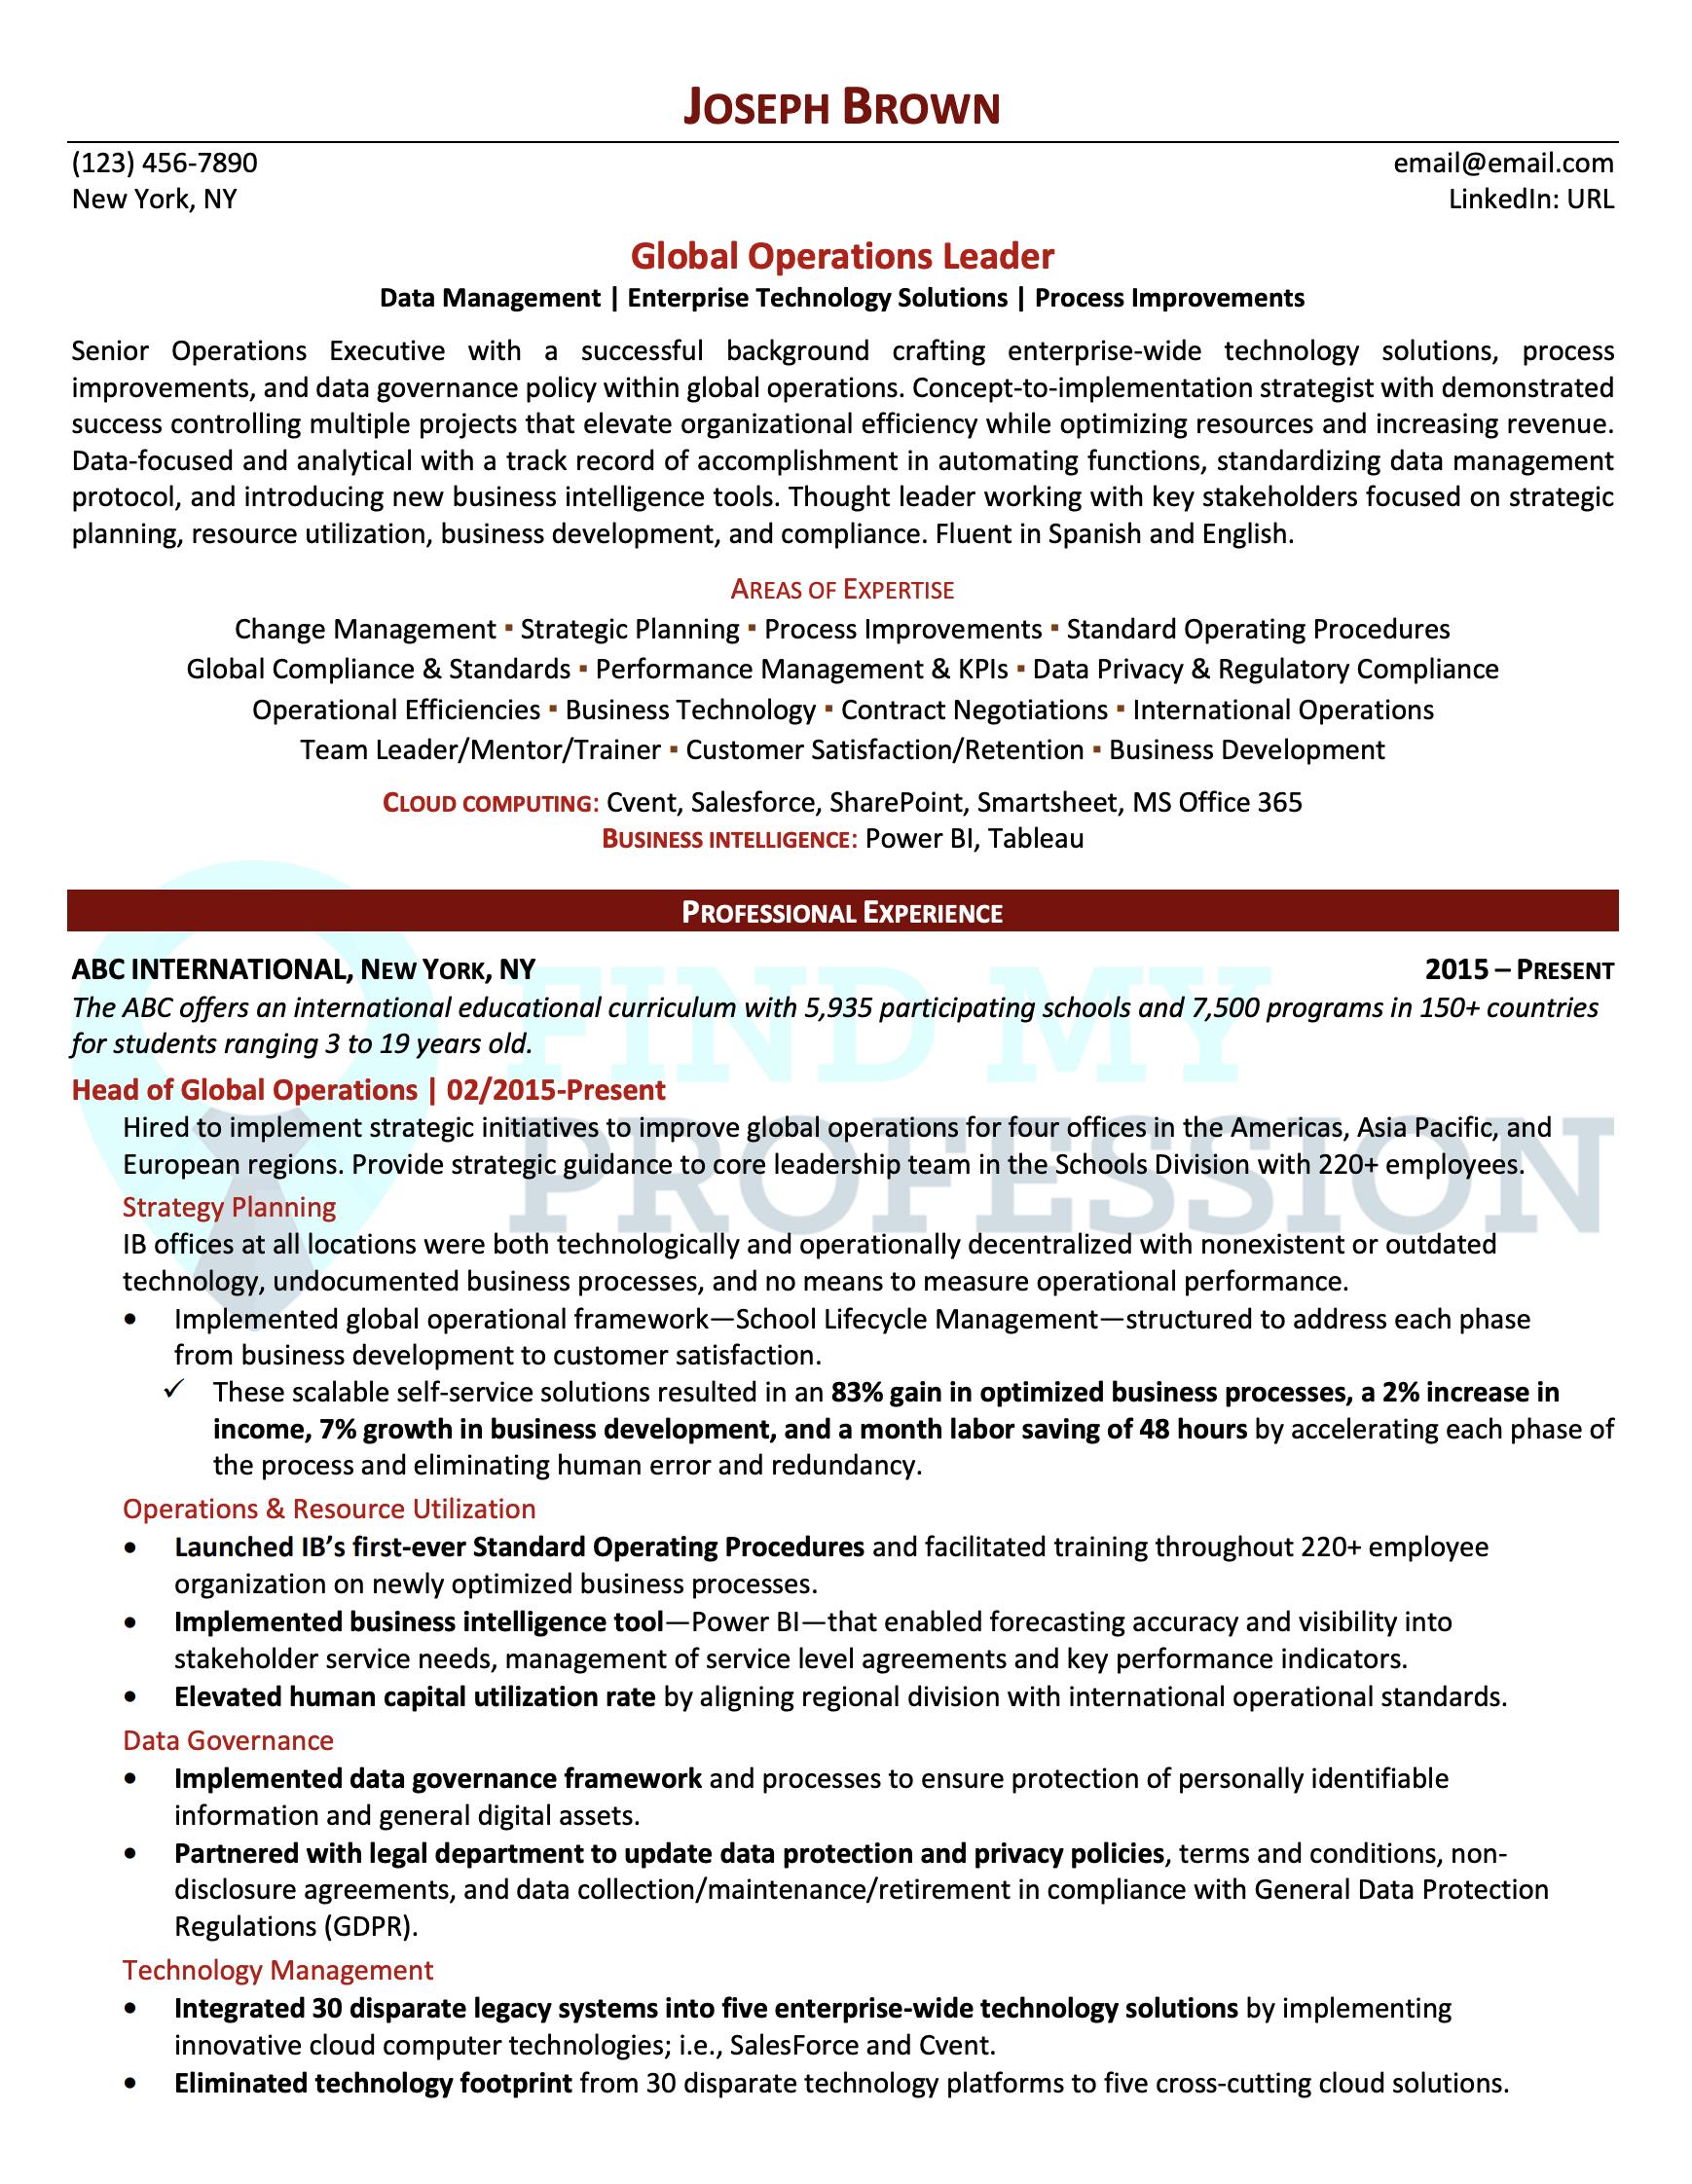 Global Operations Executive Resume Sample